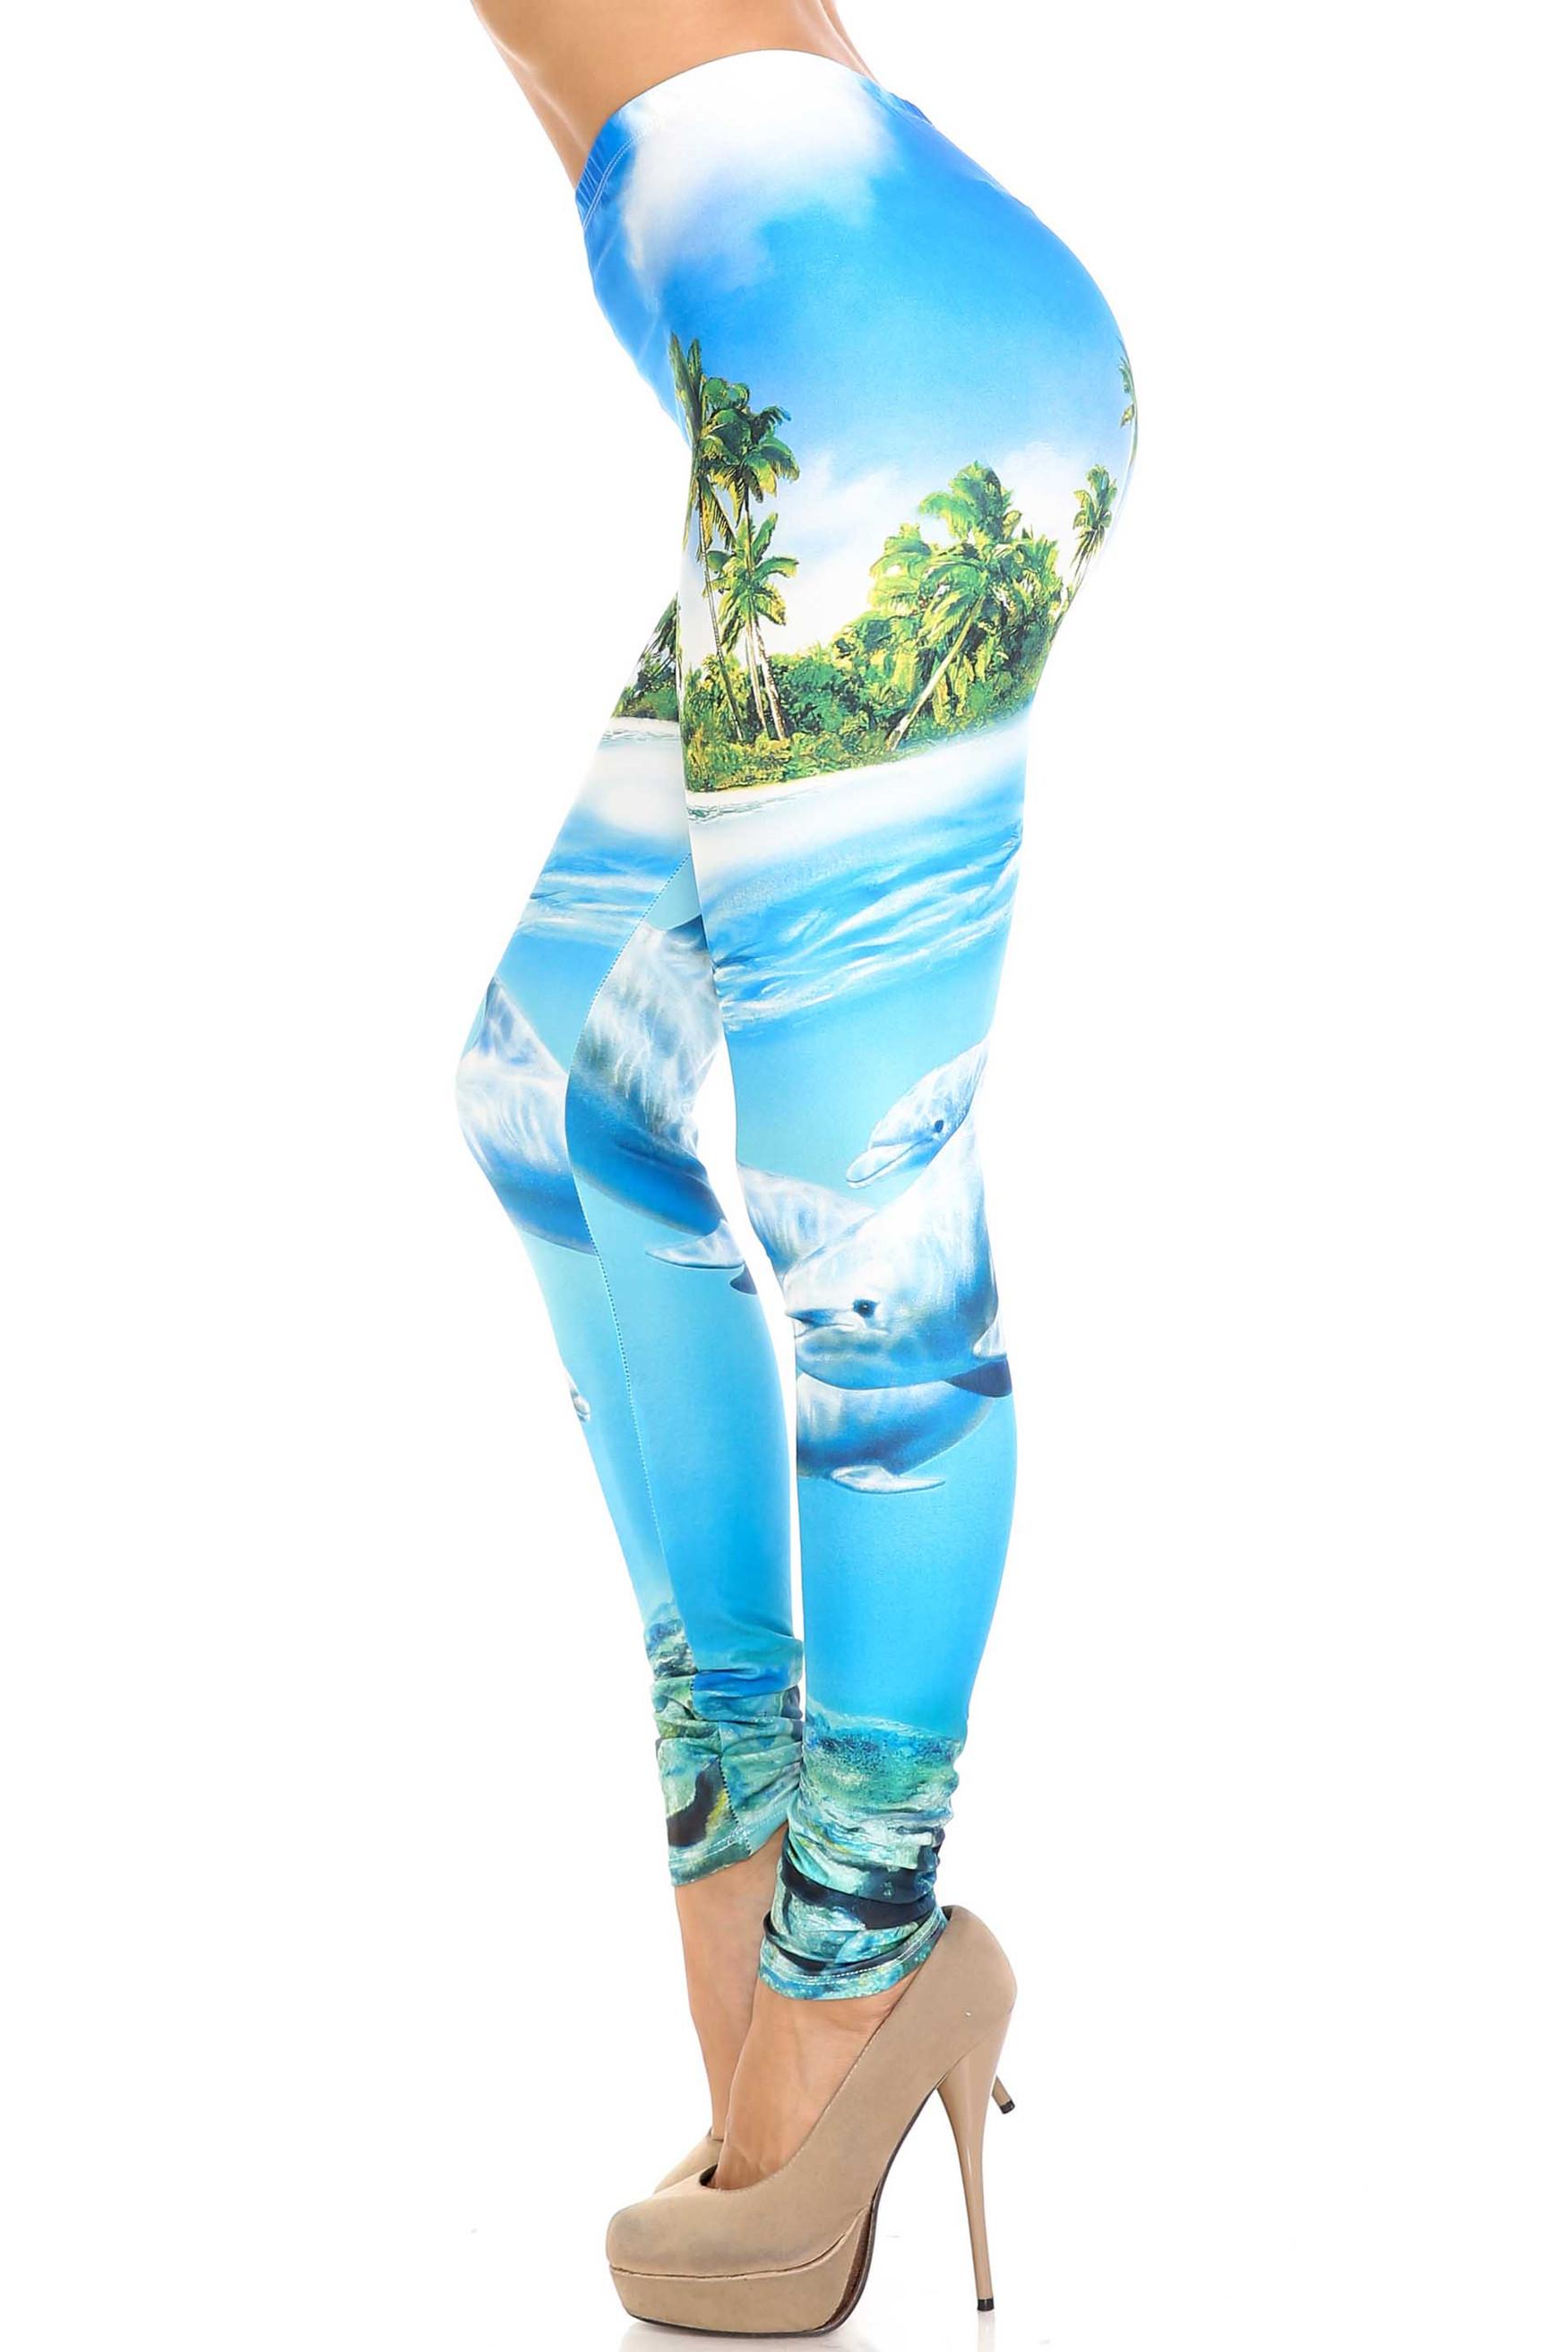 Creamy Soft Dolphin Paradise Plus Size Leggings - By USA Fashion™